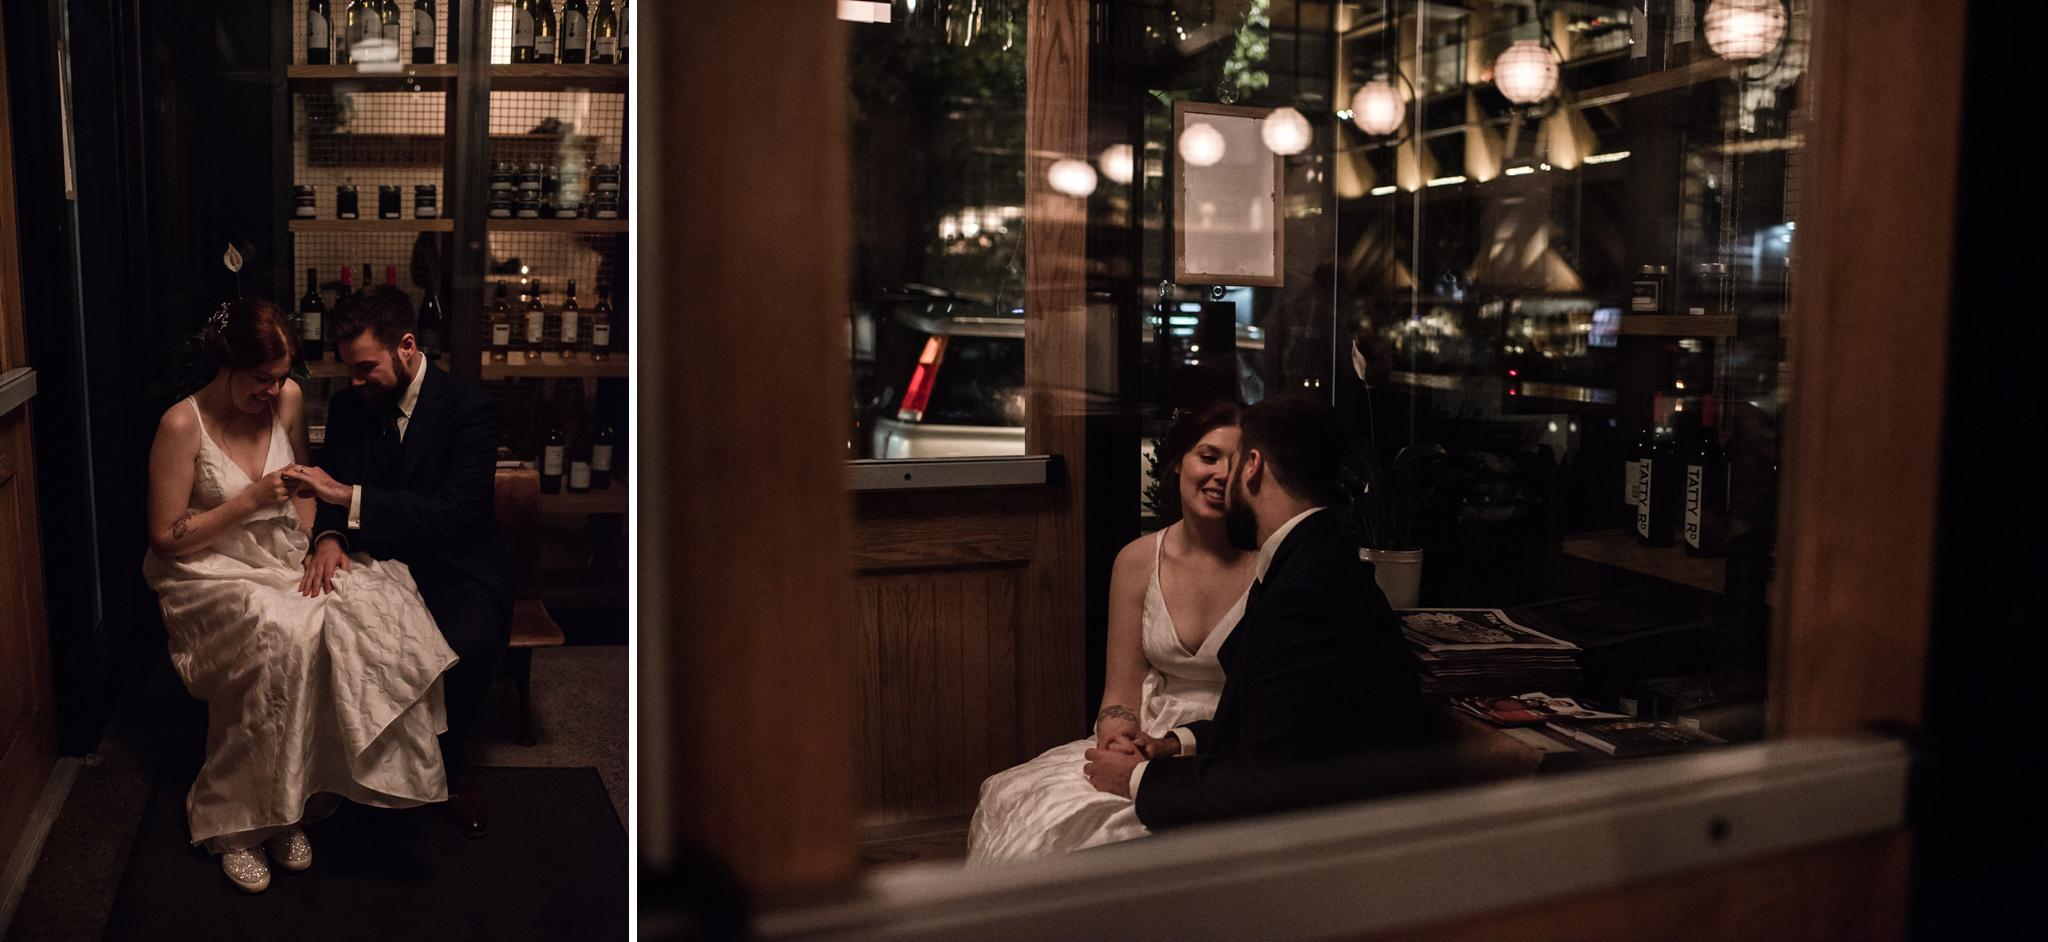 101-evening-wedding-intimate-restaurant-toronto-wedding-photographer-downtown.jpg